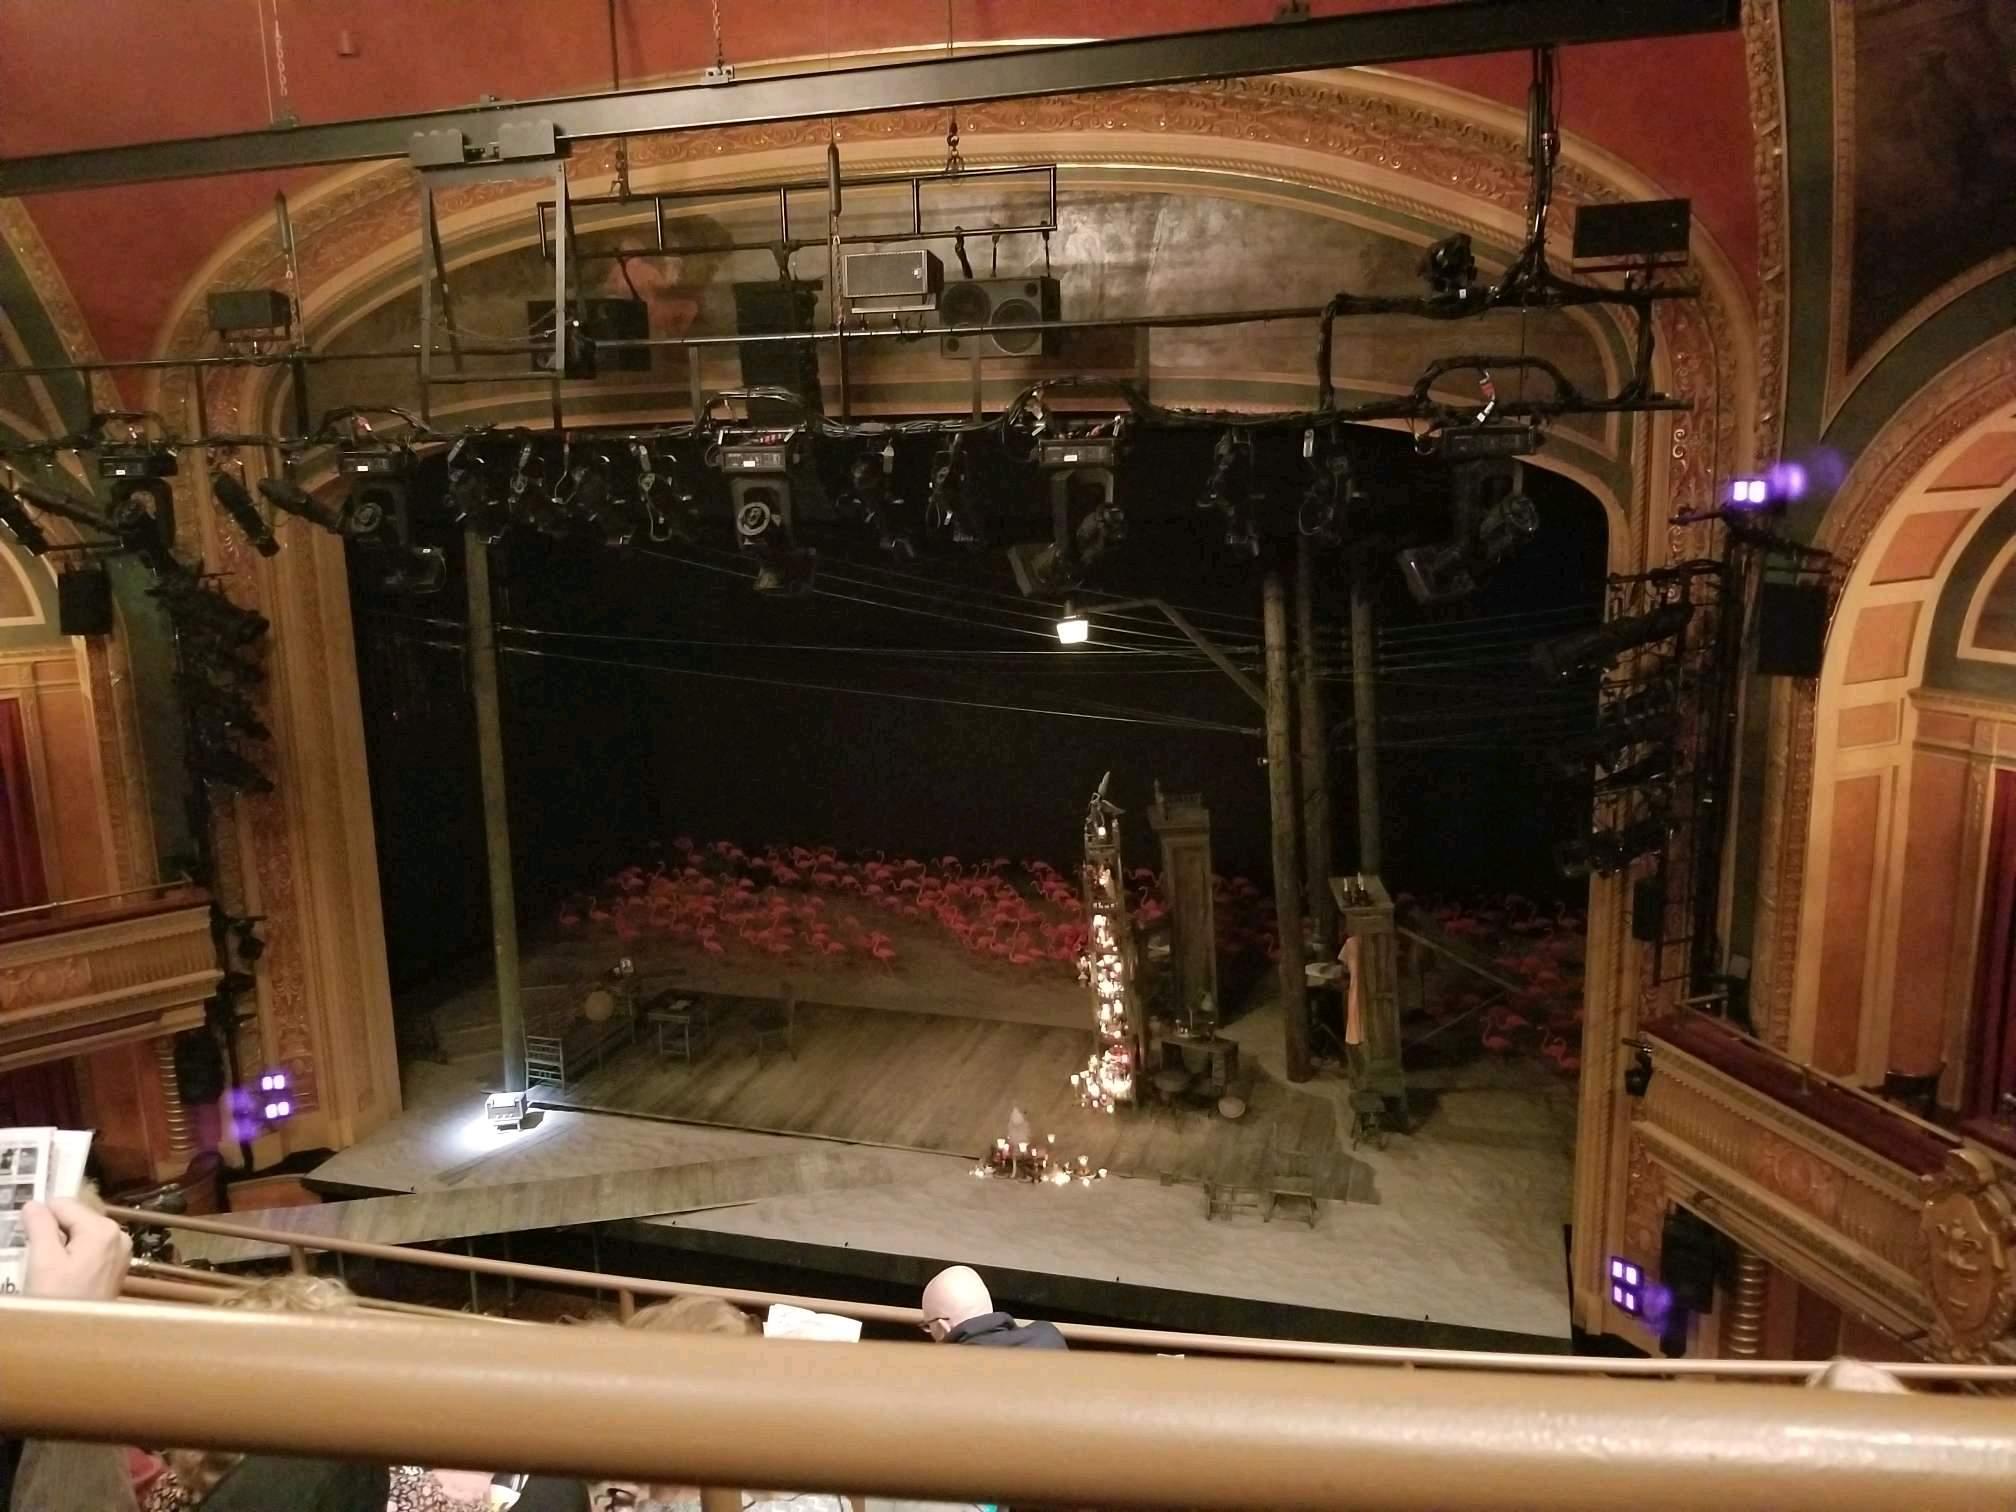 American Airlines Theatre Section Rear Mezzanine Row E Seat 111